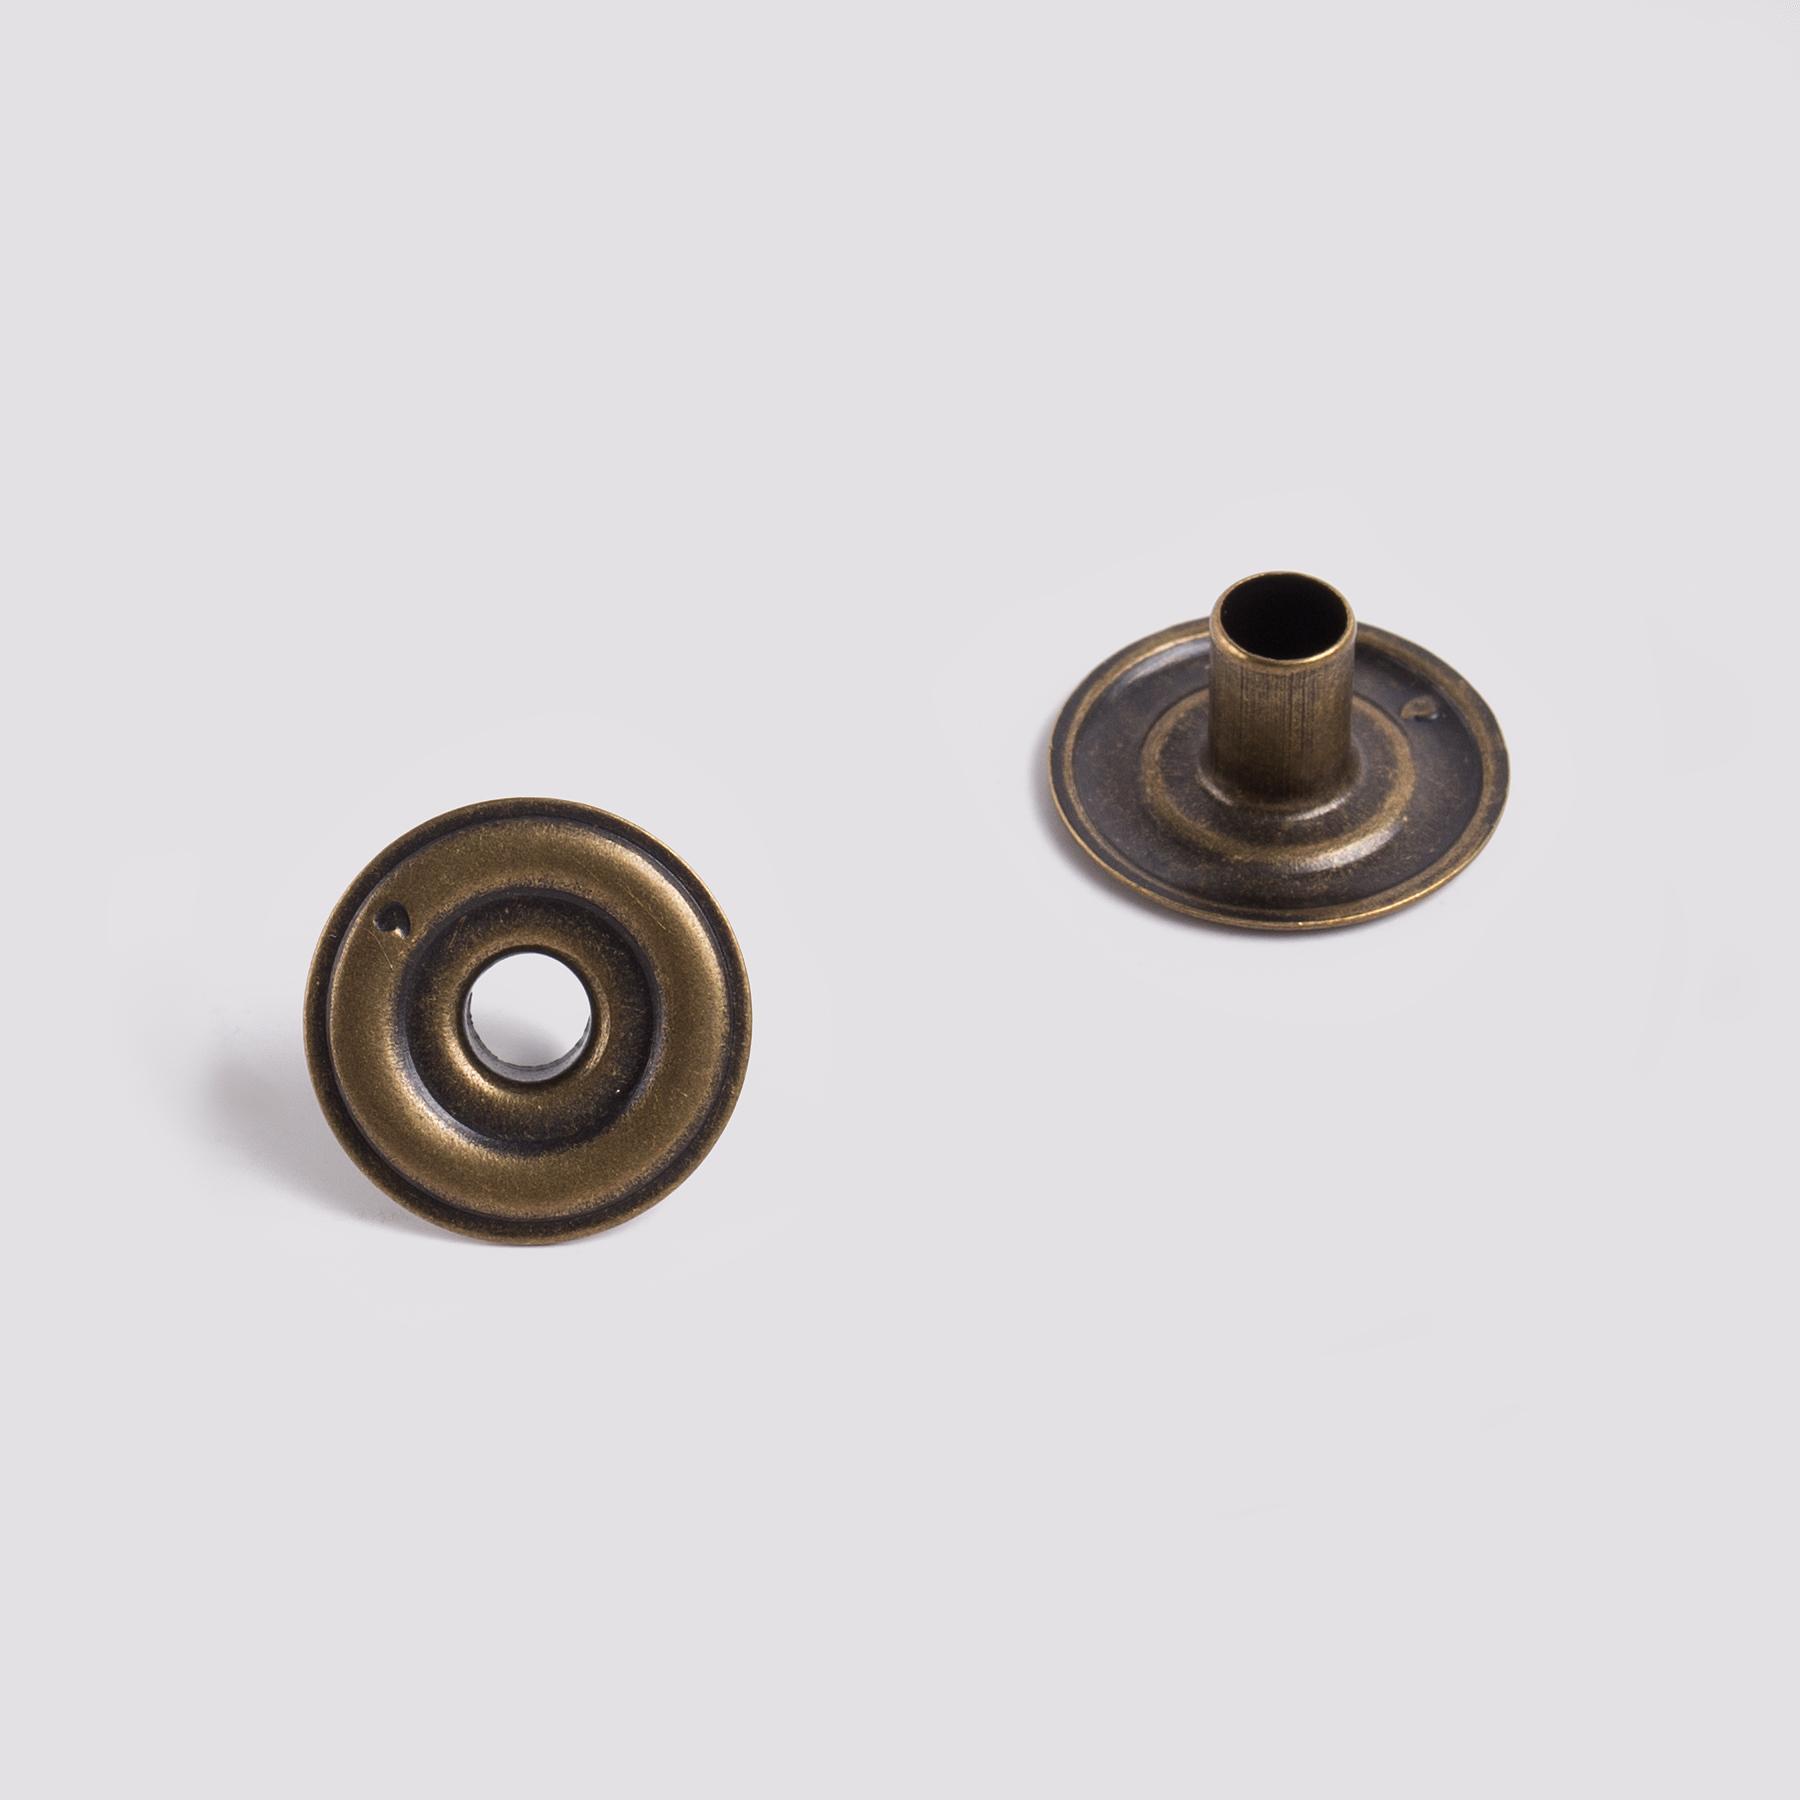 13mm Brass Snap Fasteners